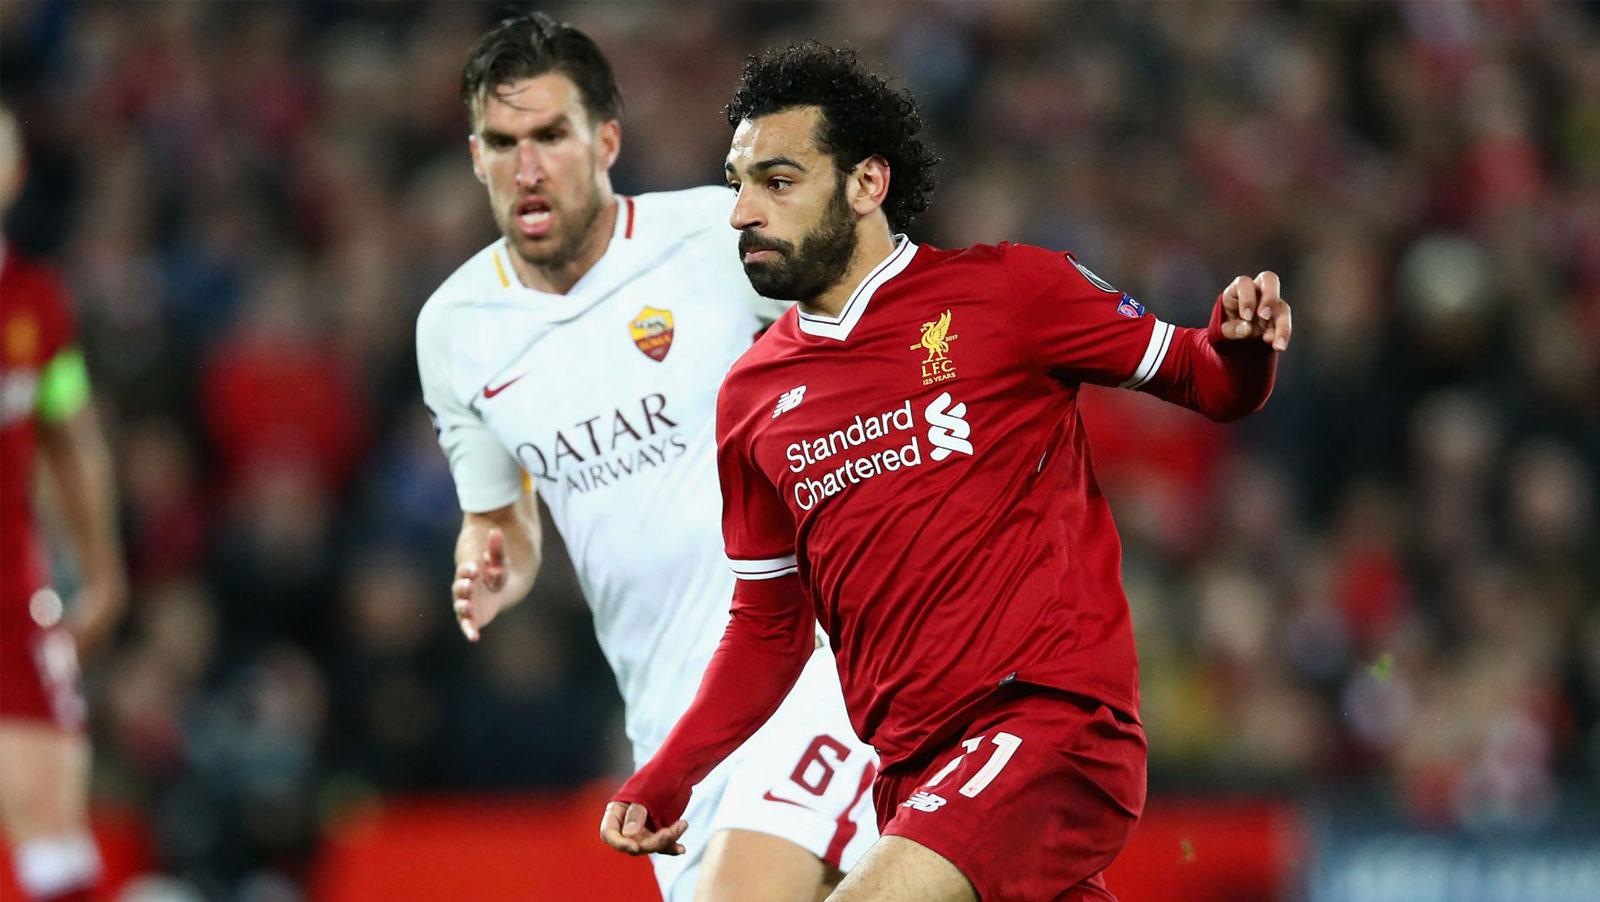 Champions League review: Mo Salah destroys Roma in semi final masterclass